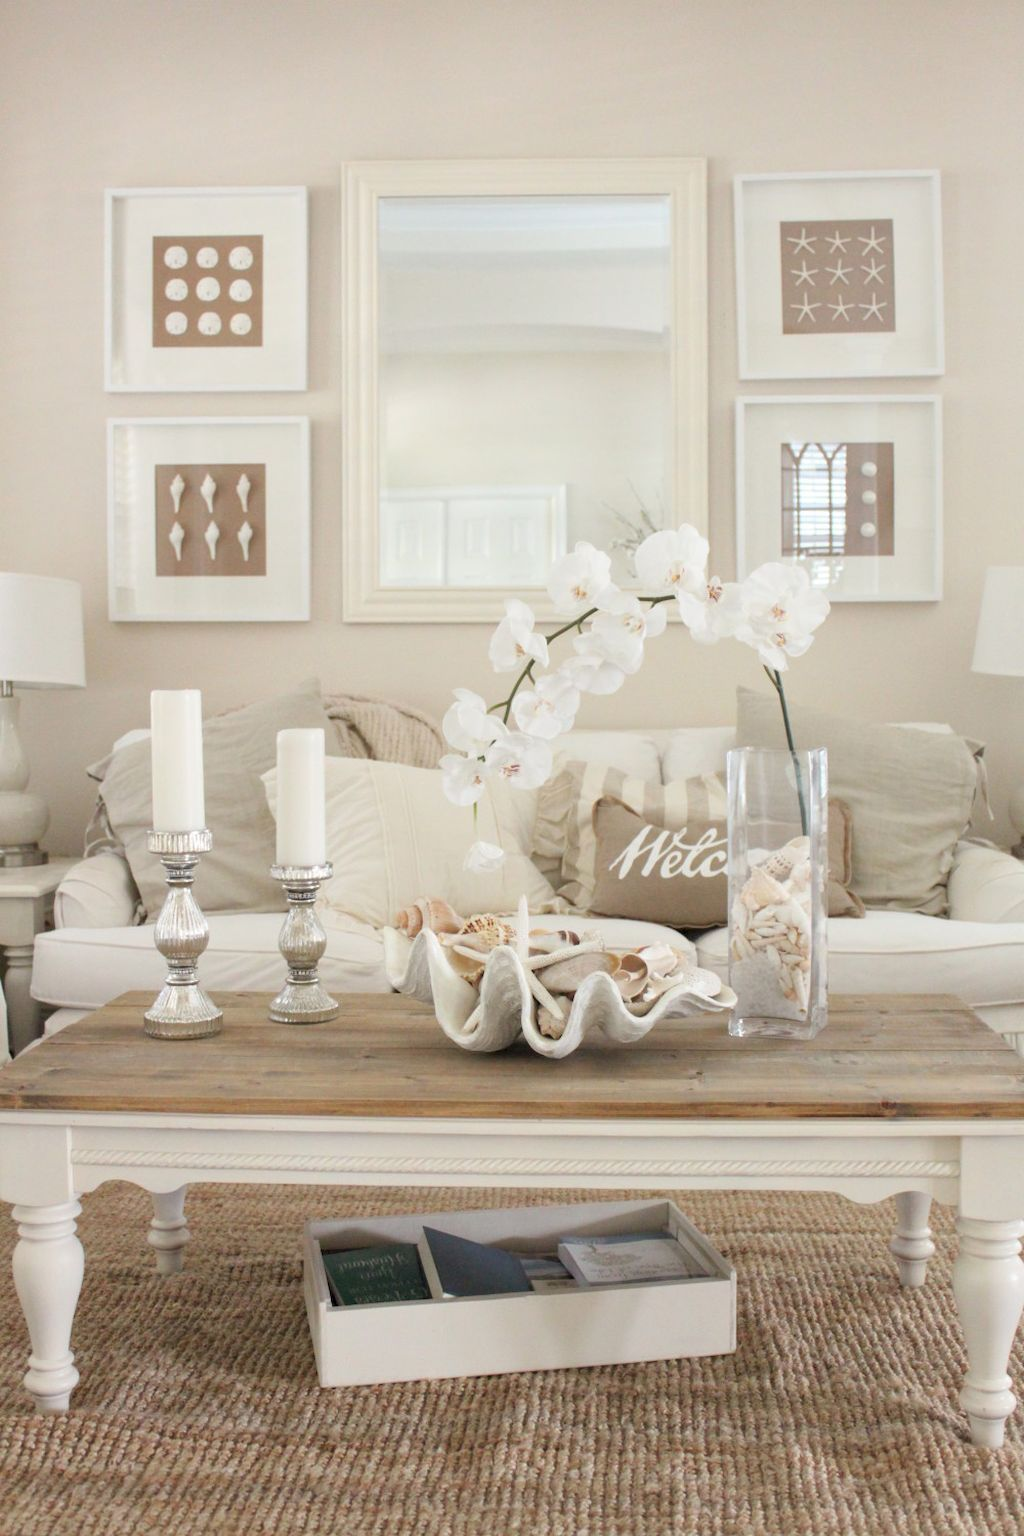 65 Coastal Style Living Room Design and Decor Ideas | Coastal style ...